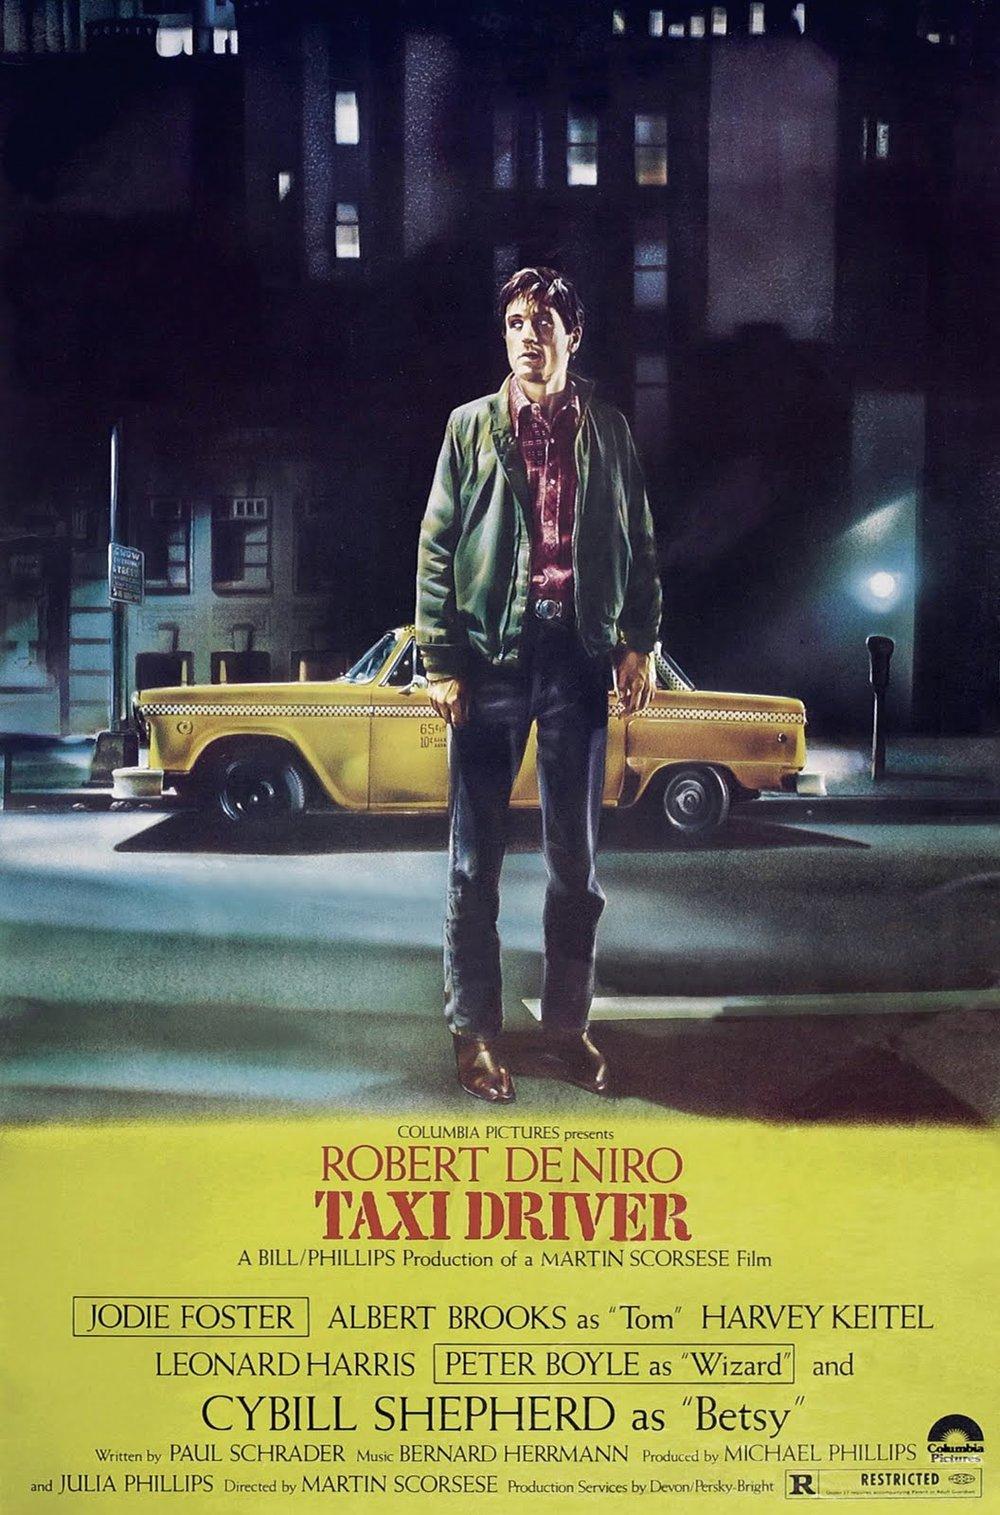 TAXI DRIVER (1976) Spoken by Travis Bickle / Robert Deniro